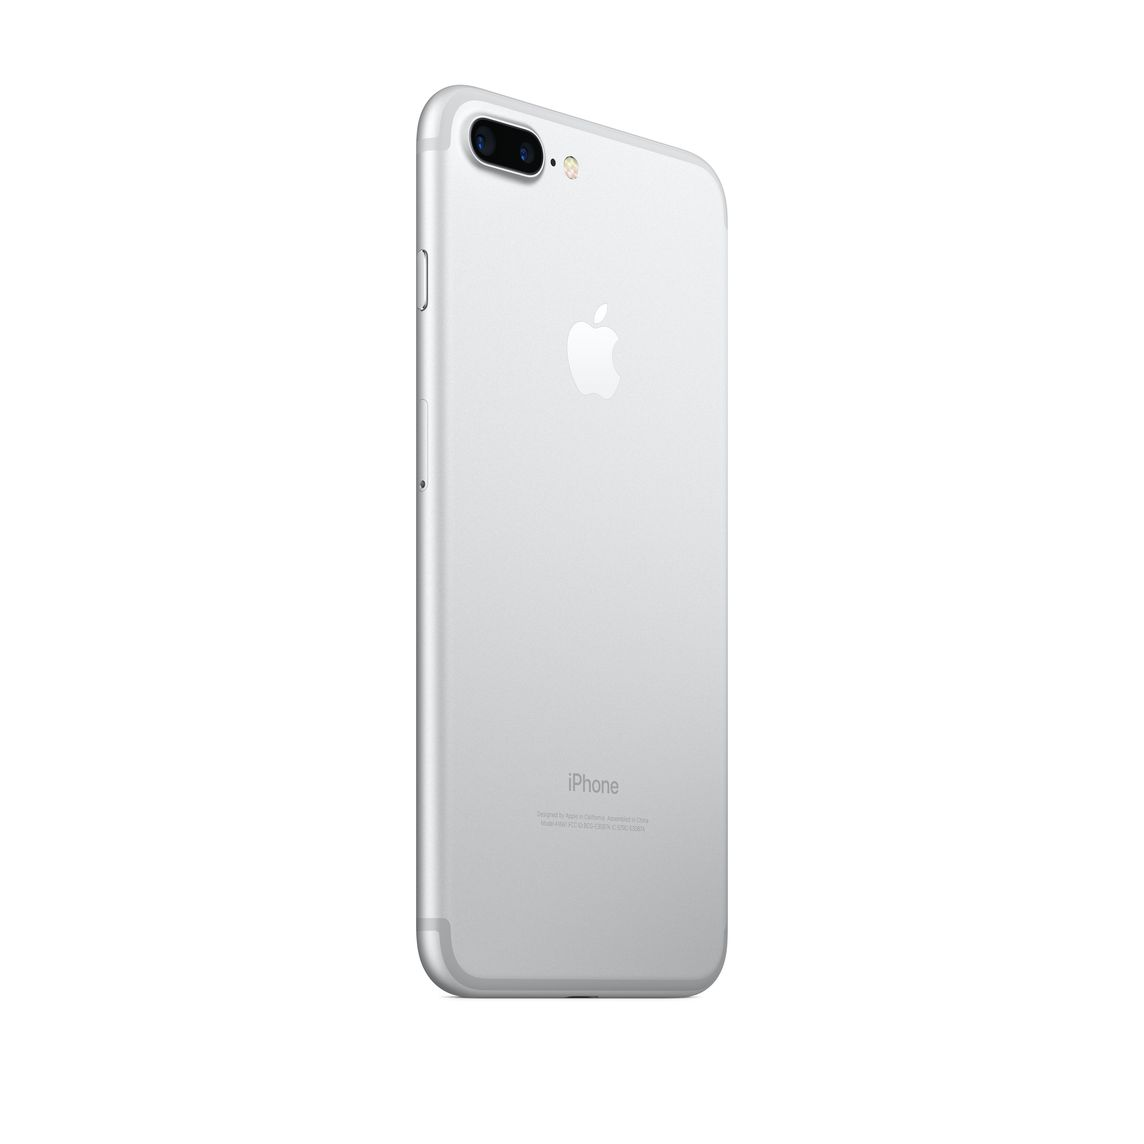 Refurbished iPhone 7 Plus 256GB - Silver (Unlocked)